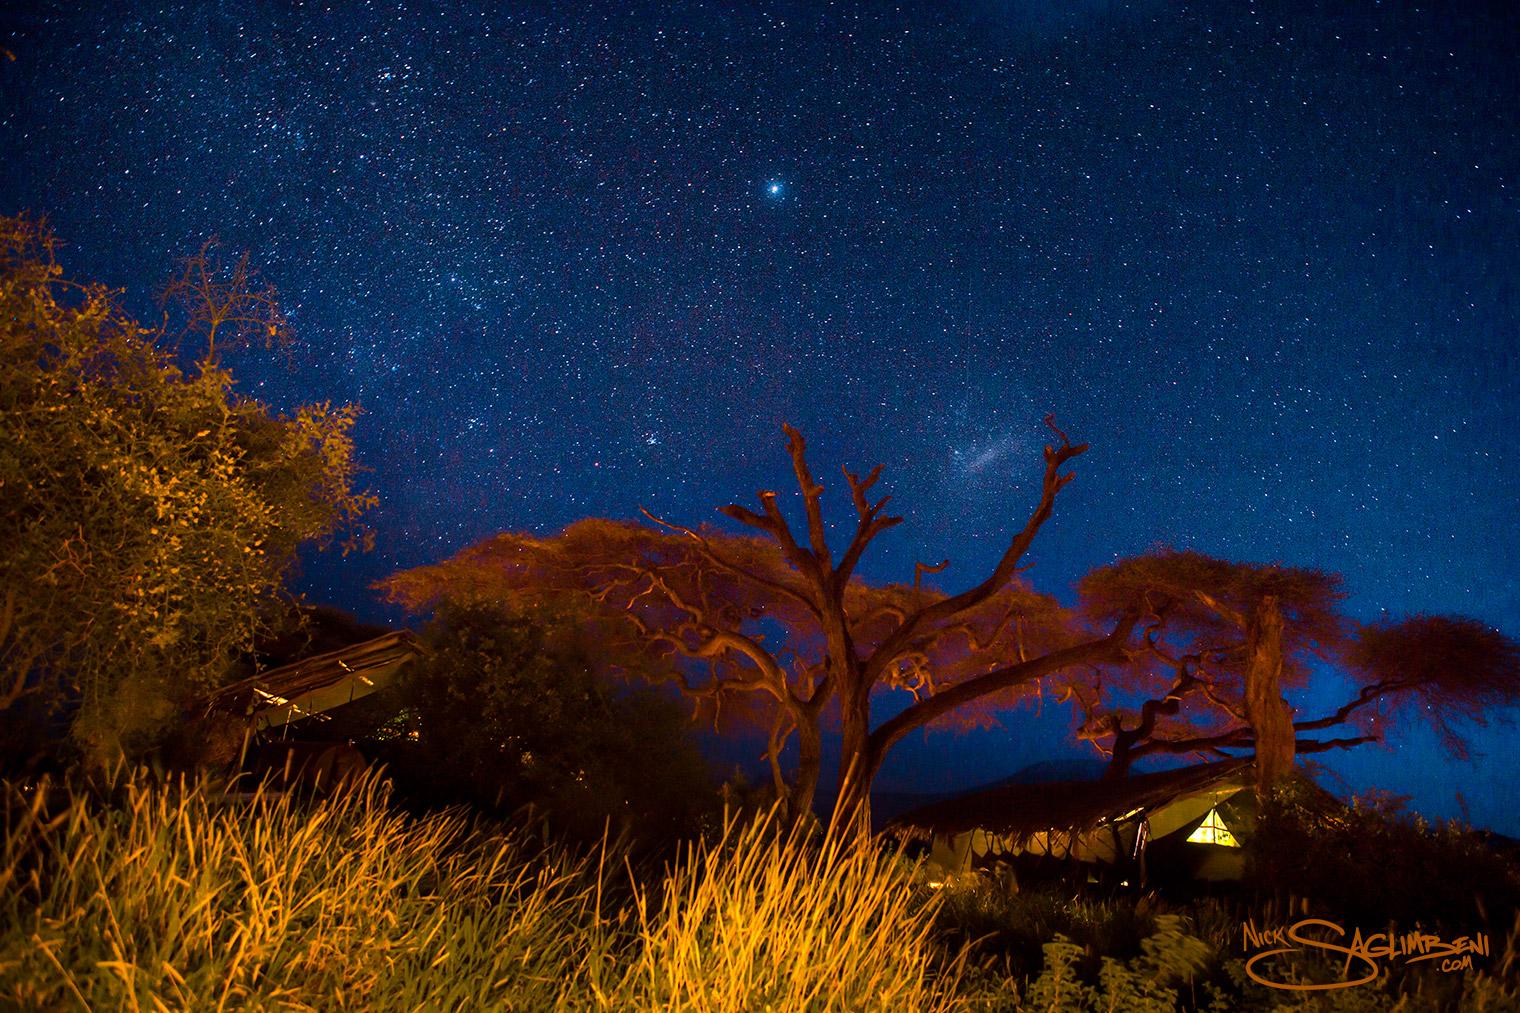 Zuru Kenya - African night sky